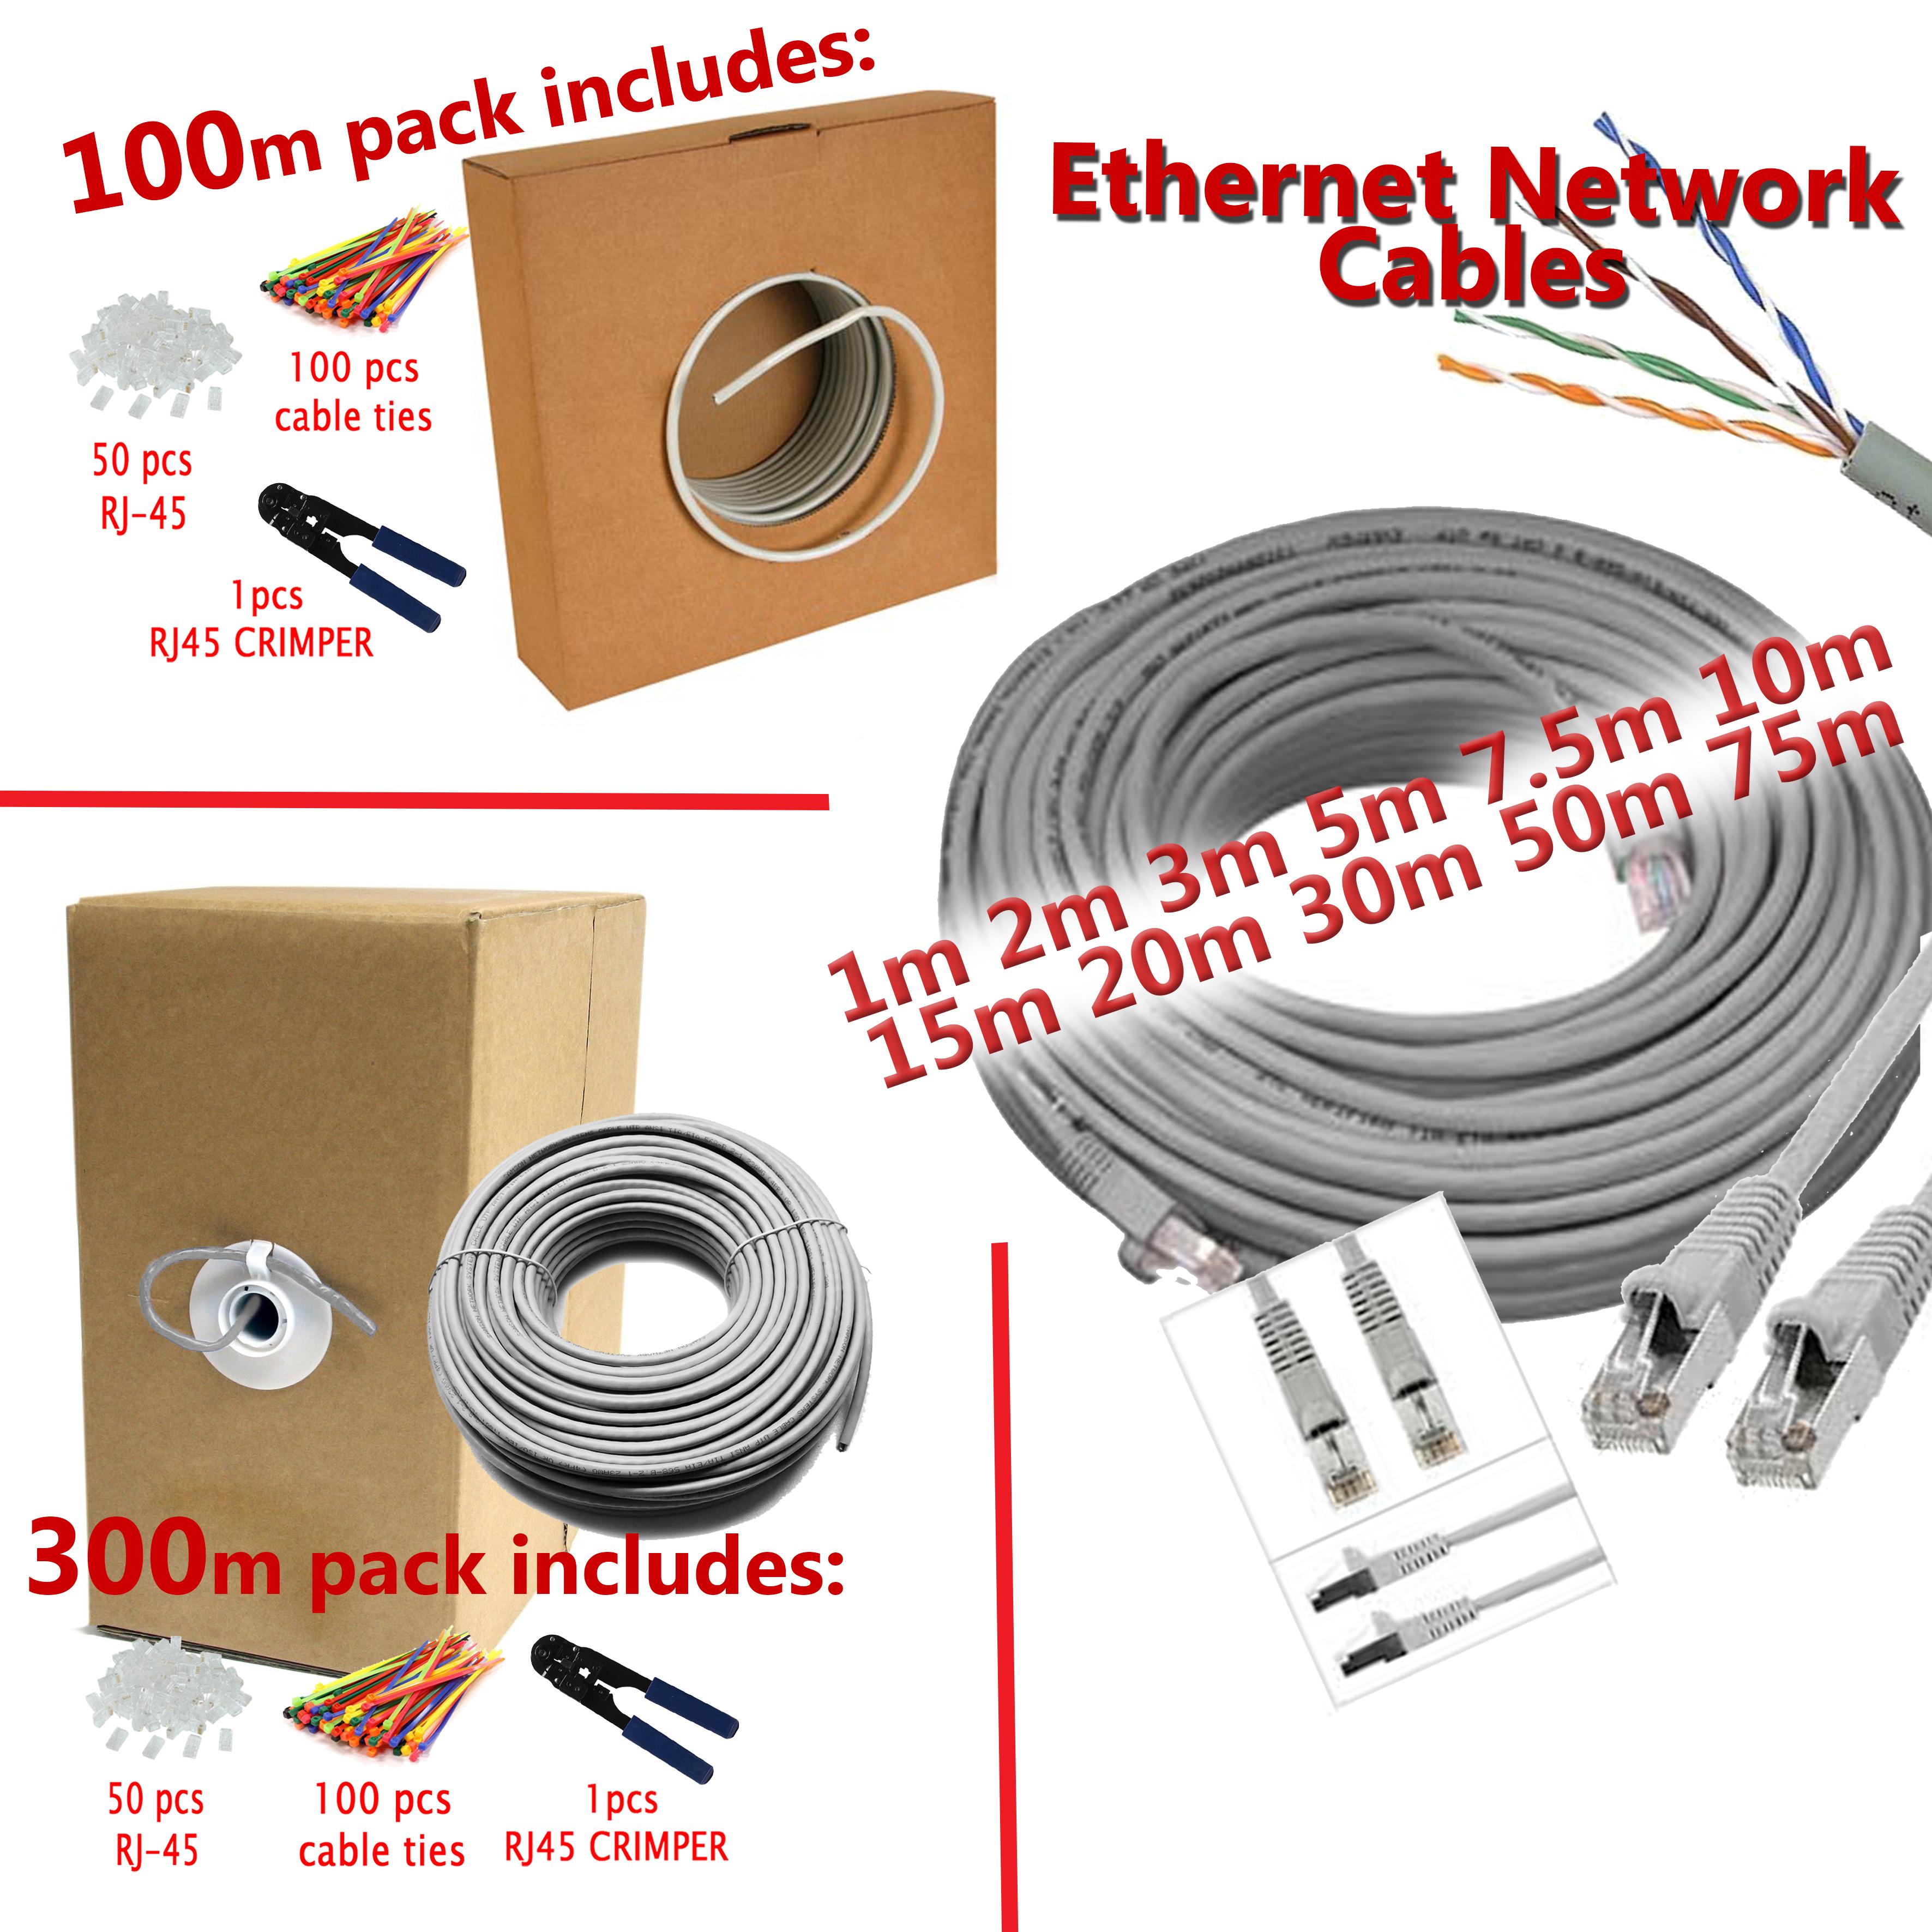 cat6 ethernet network cable 50m 75m 100m 300m grey. Black Bedroom Furniture Sets. Home Design Ideas